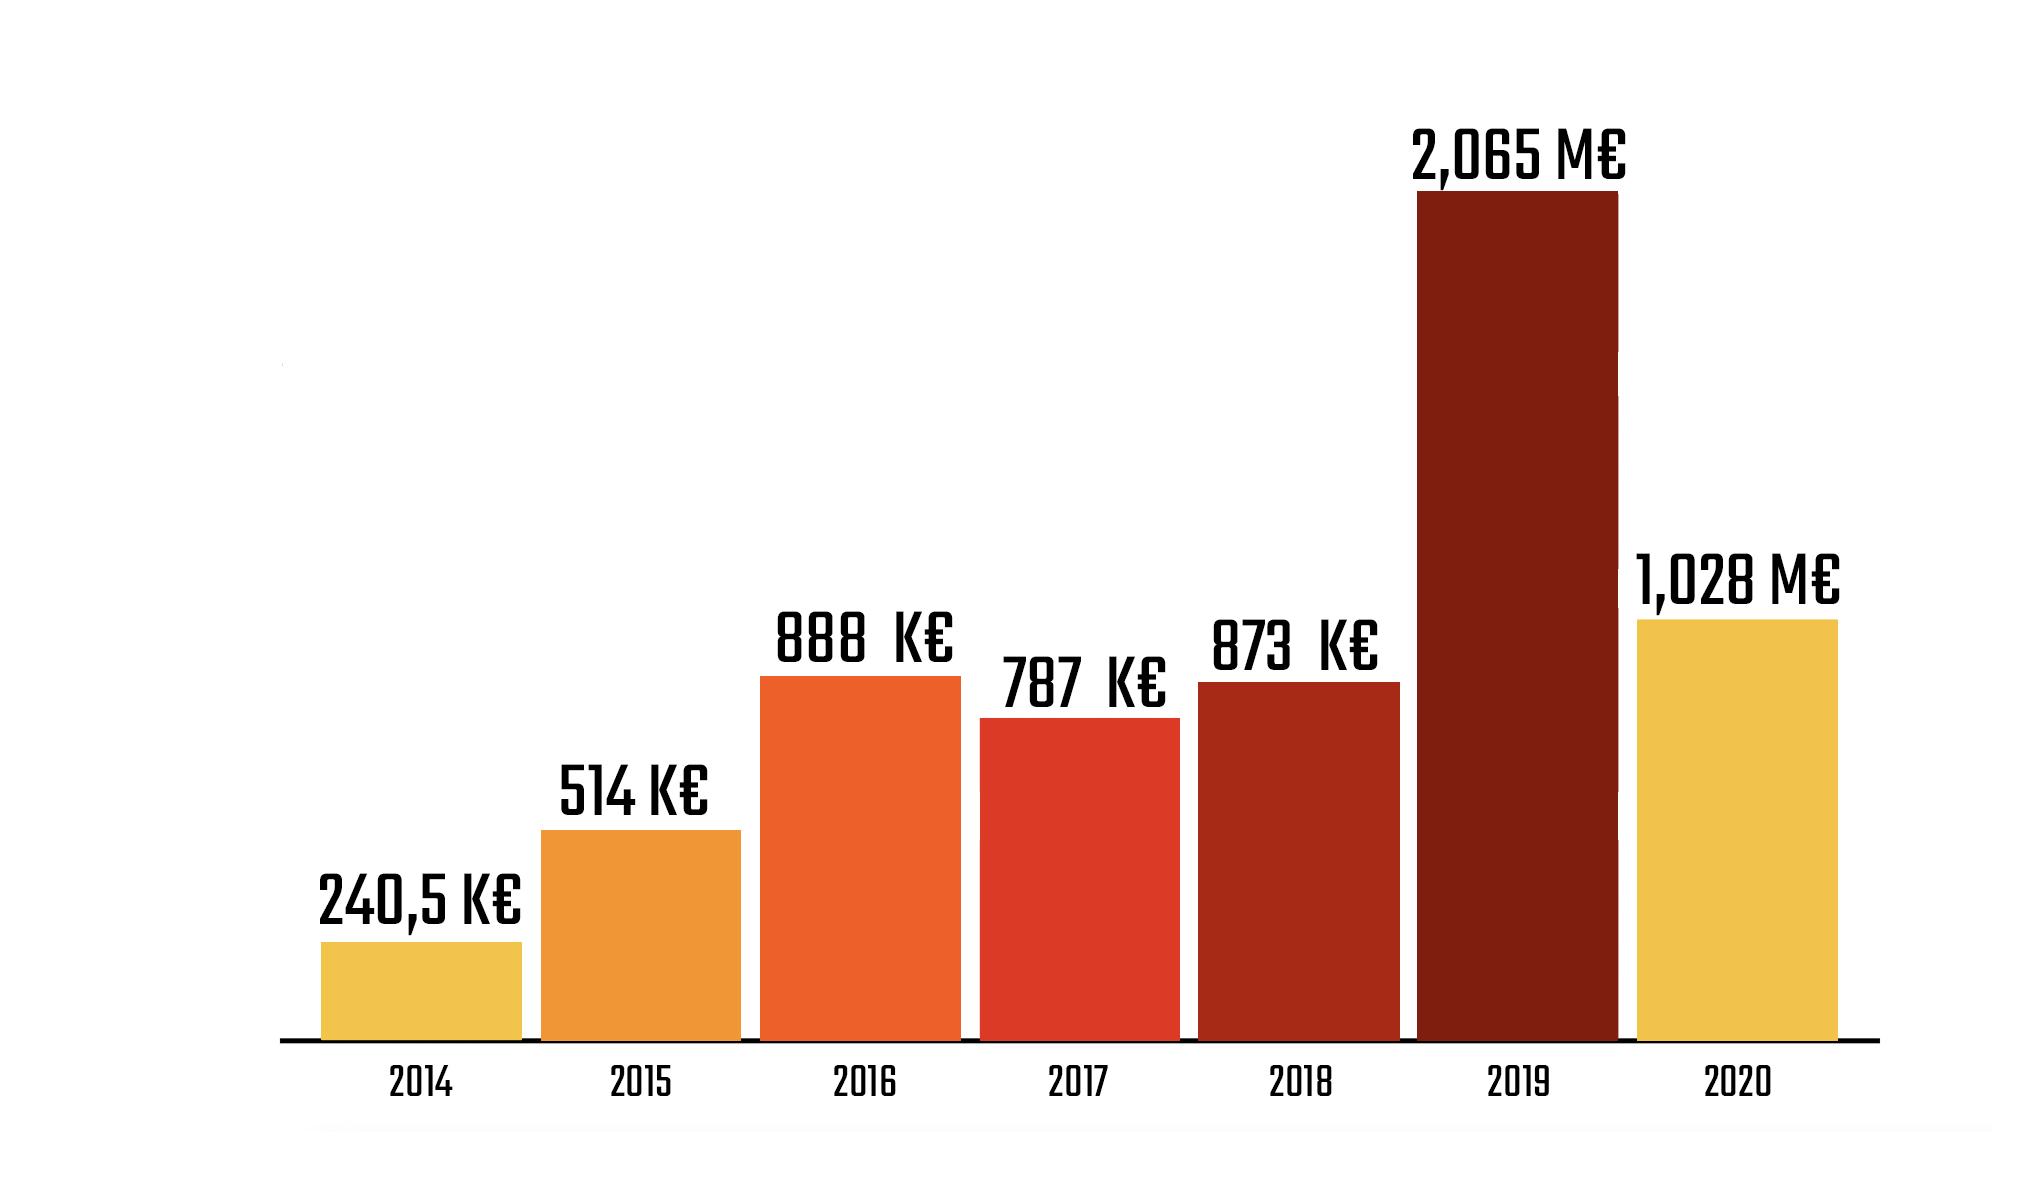 Evolution chiffres d'affaires Kaiseral